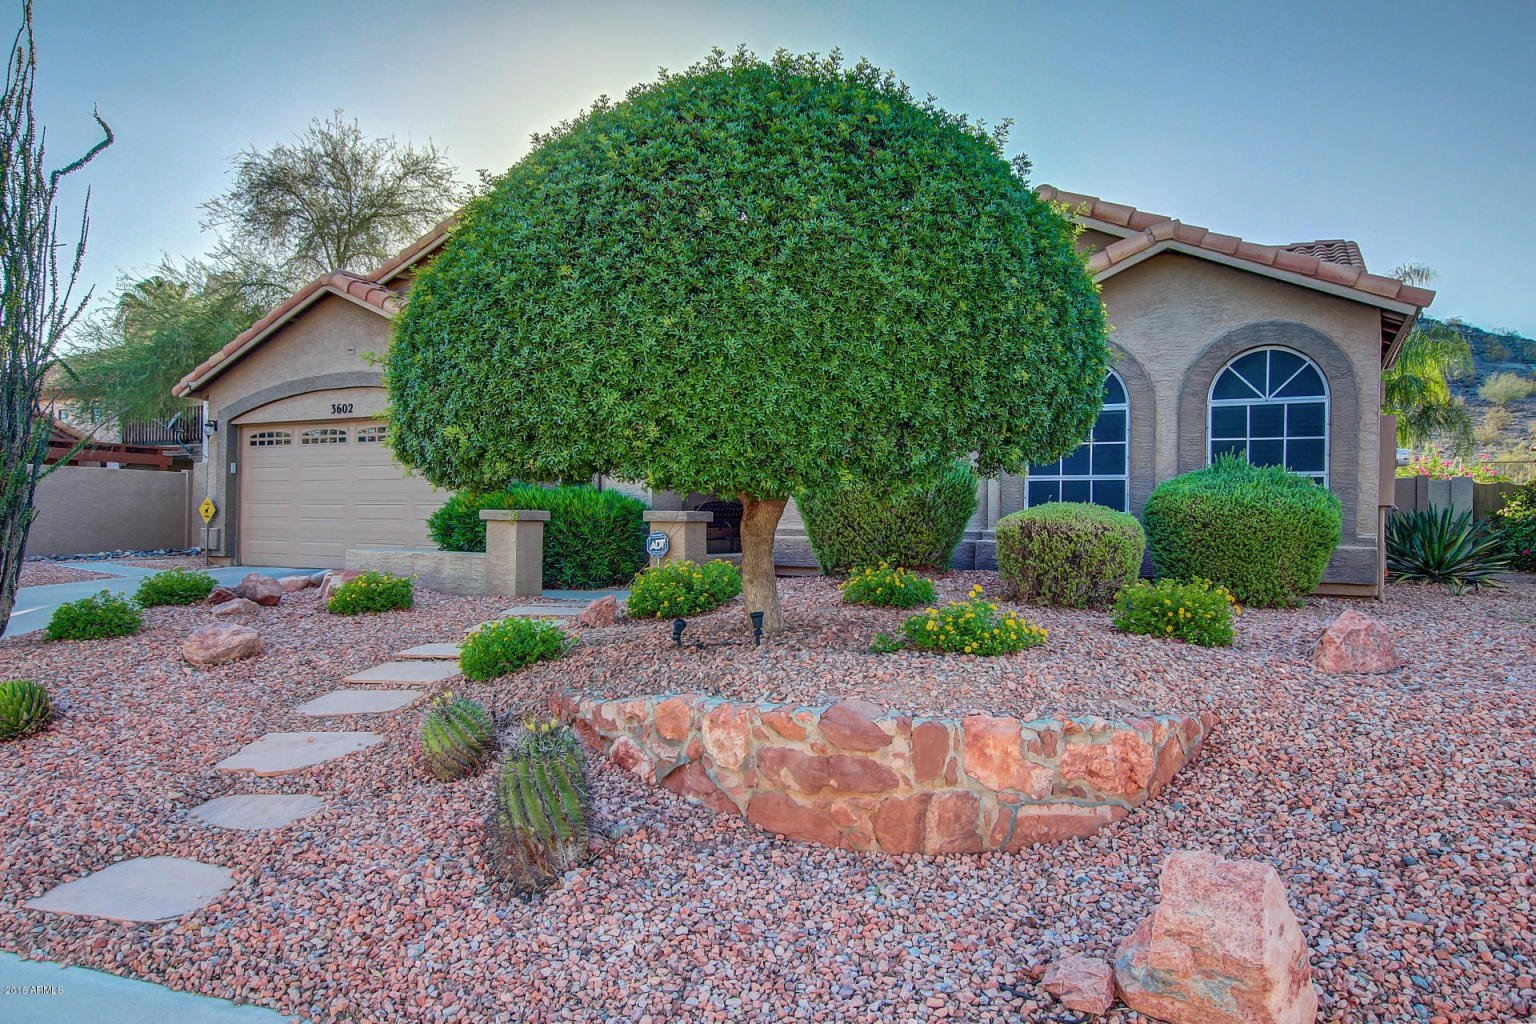 Photo 2: Photos: 3602 E Mountain Sky Avenue in Phoenix: Ahwatukee House for sale : MLS®# 5462780